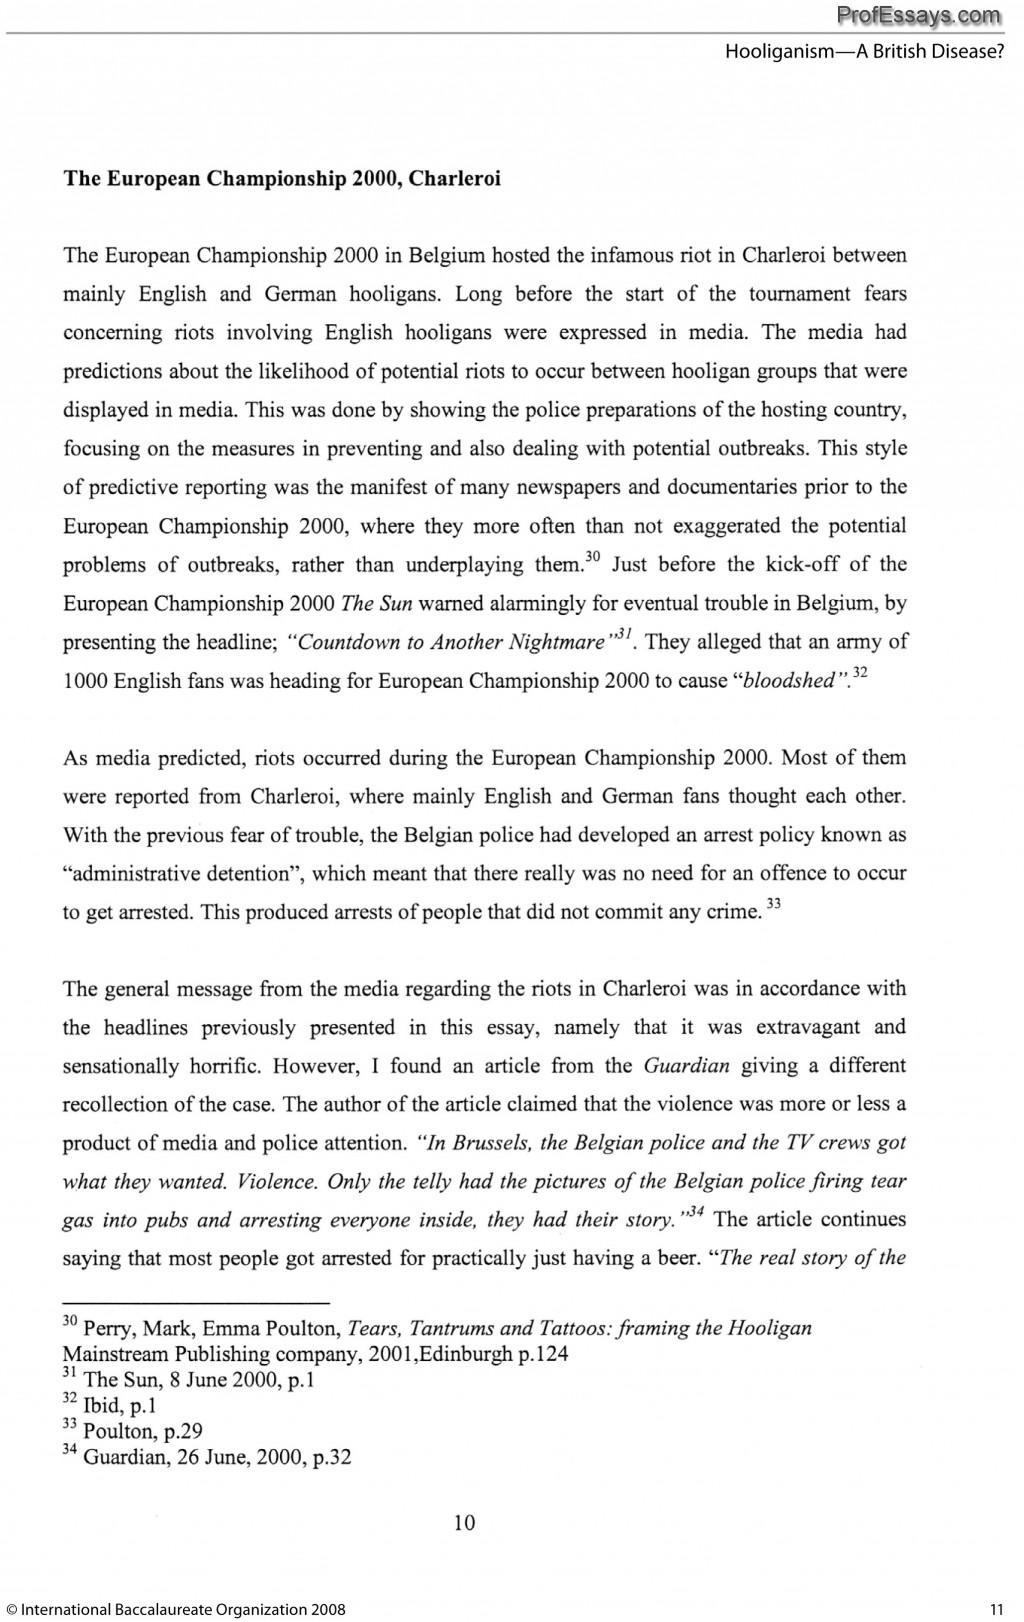 009 Ib Extended Essay Free Sample Example English Writing Striking Essays Creative Large